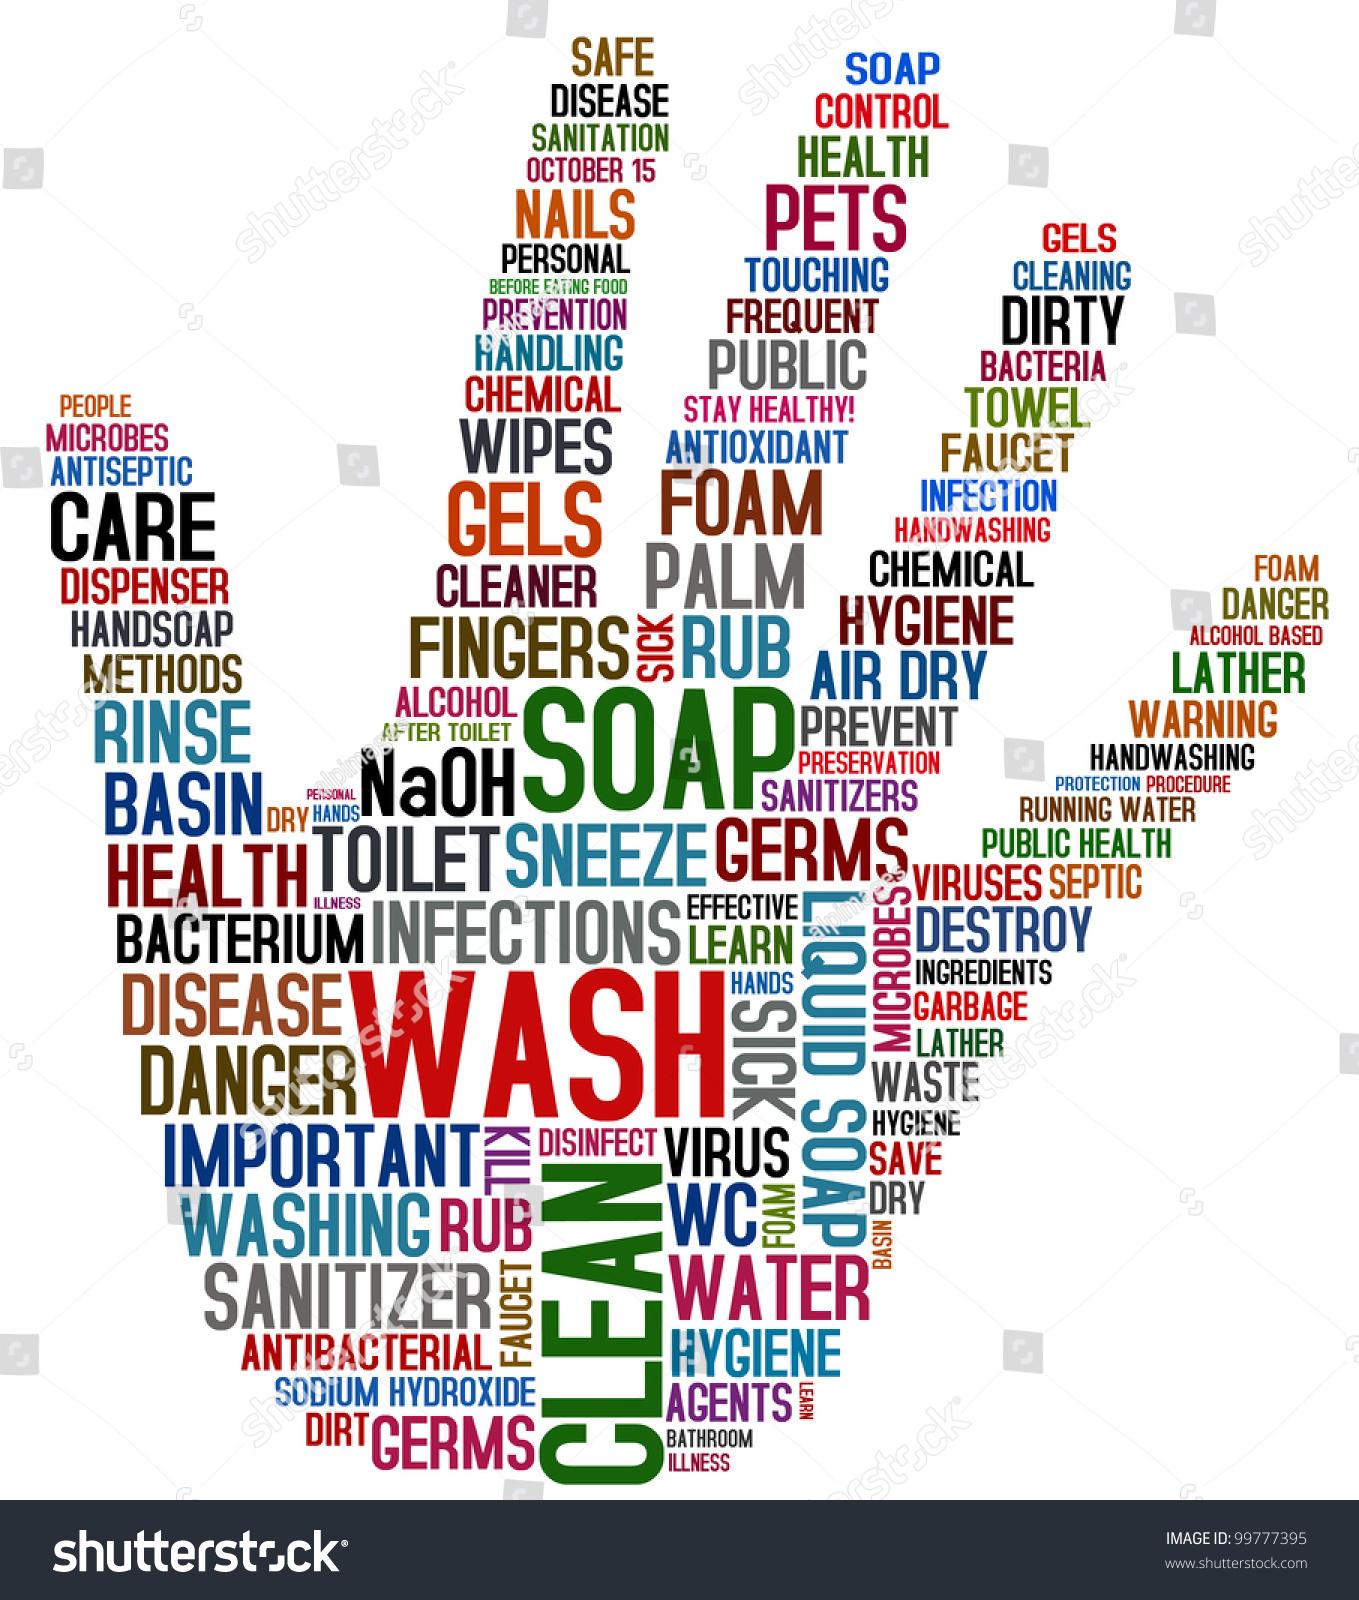 Wash Your Hands Stock Illustration 99777395 - Shutterstock